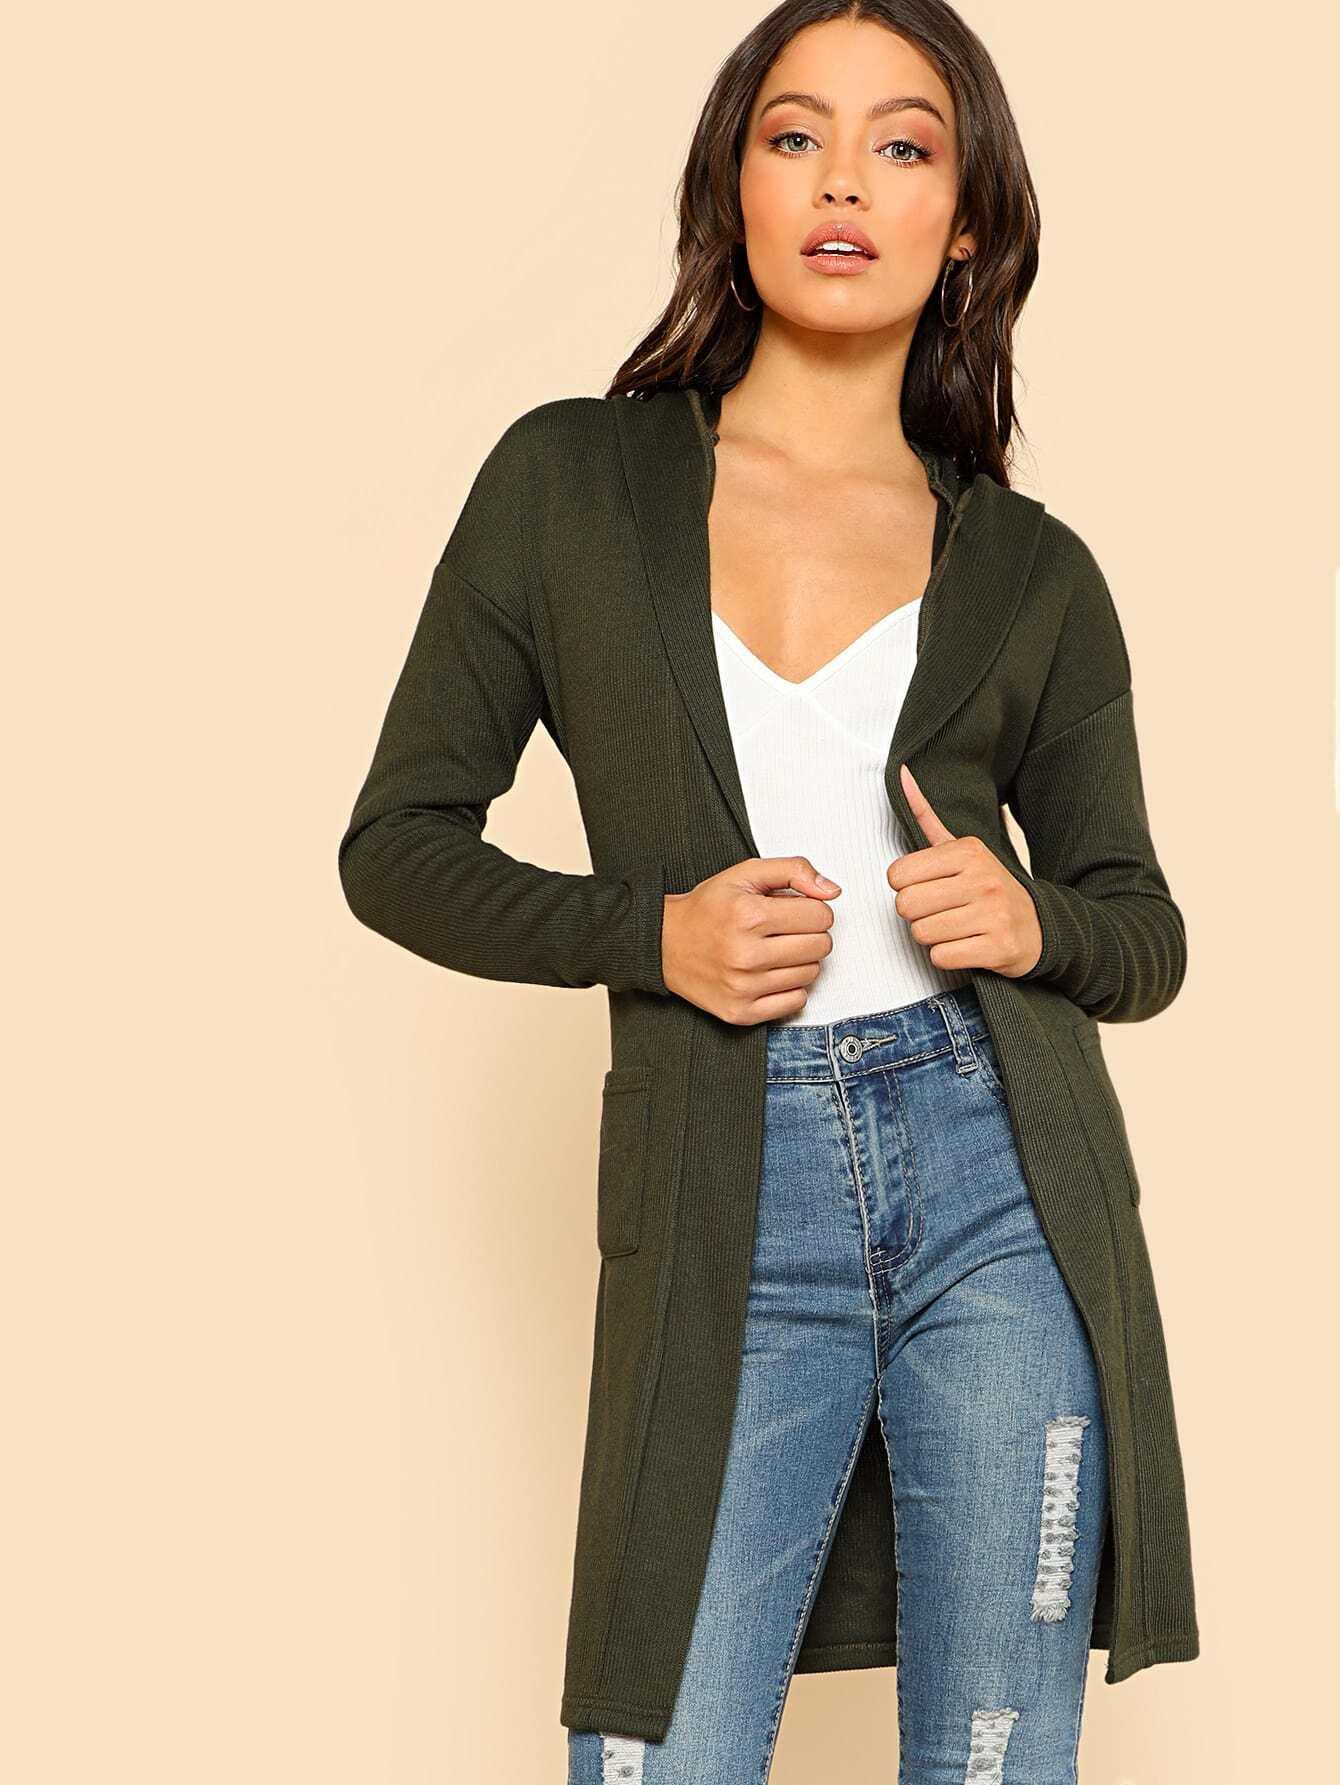 Inseam Pocket Detail Belted Hooded Jersey Cardigan -SheIn(Sheinside)